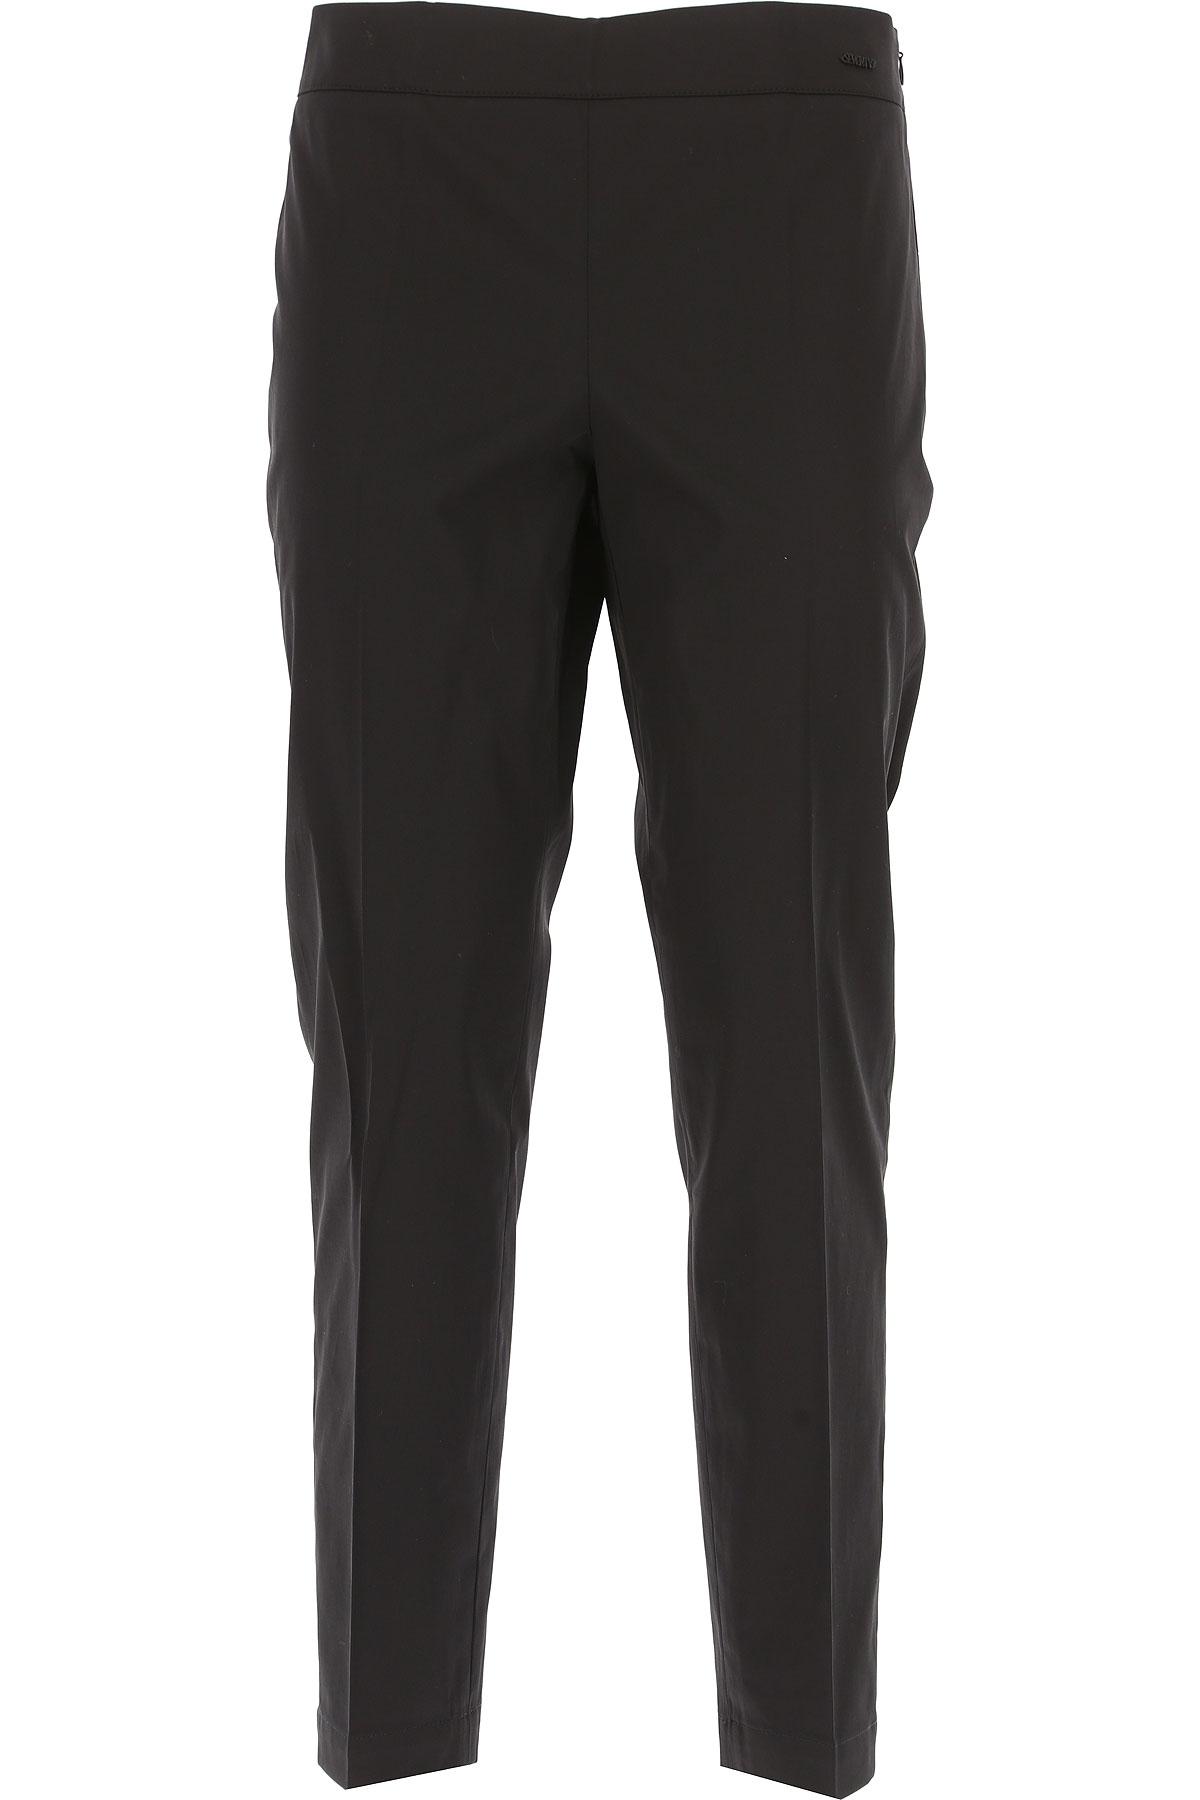 Image of Seventy Pants for Women On Sale, Black, Cotton, 2017, 10 4 8